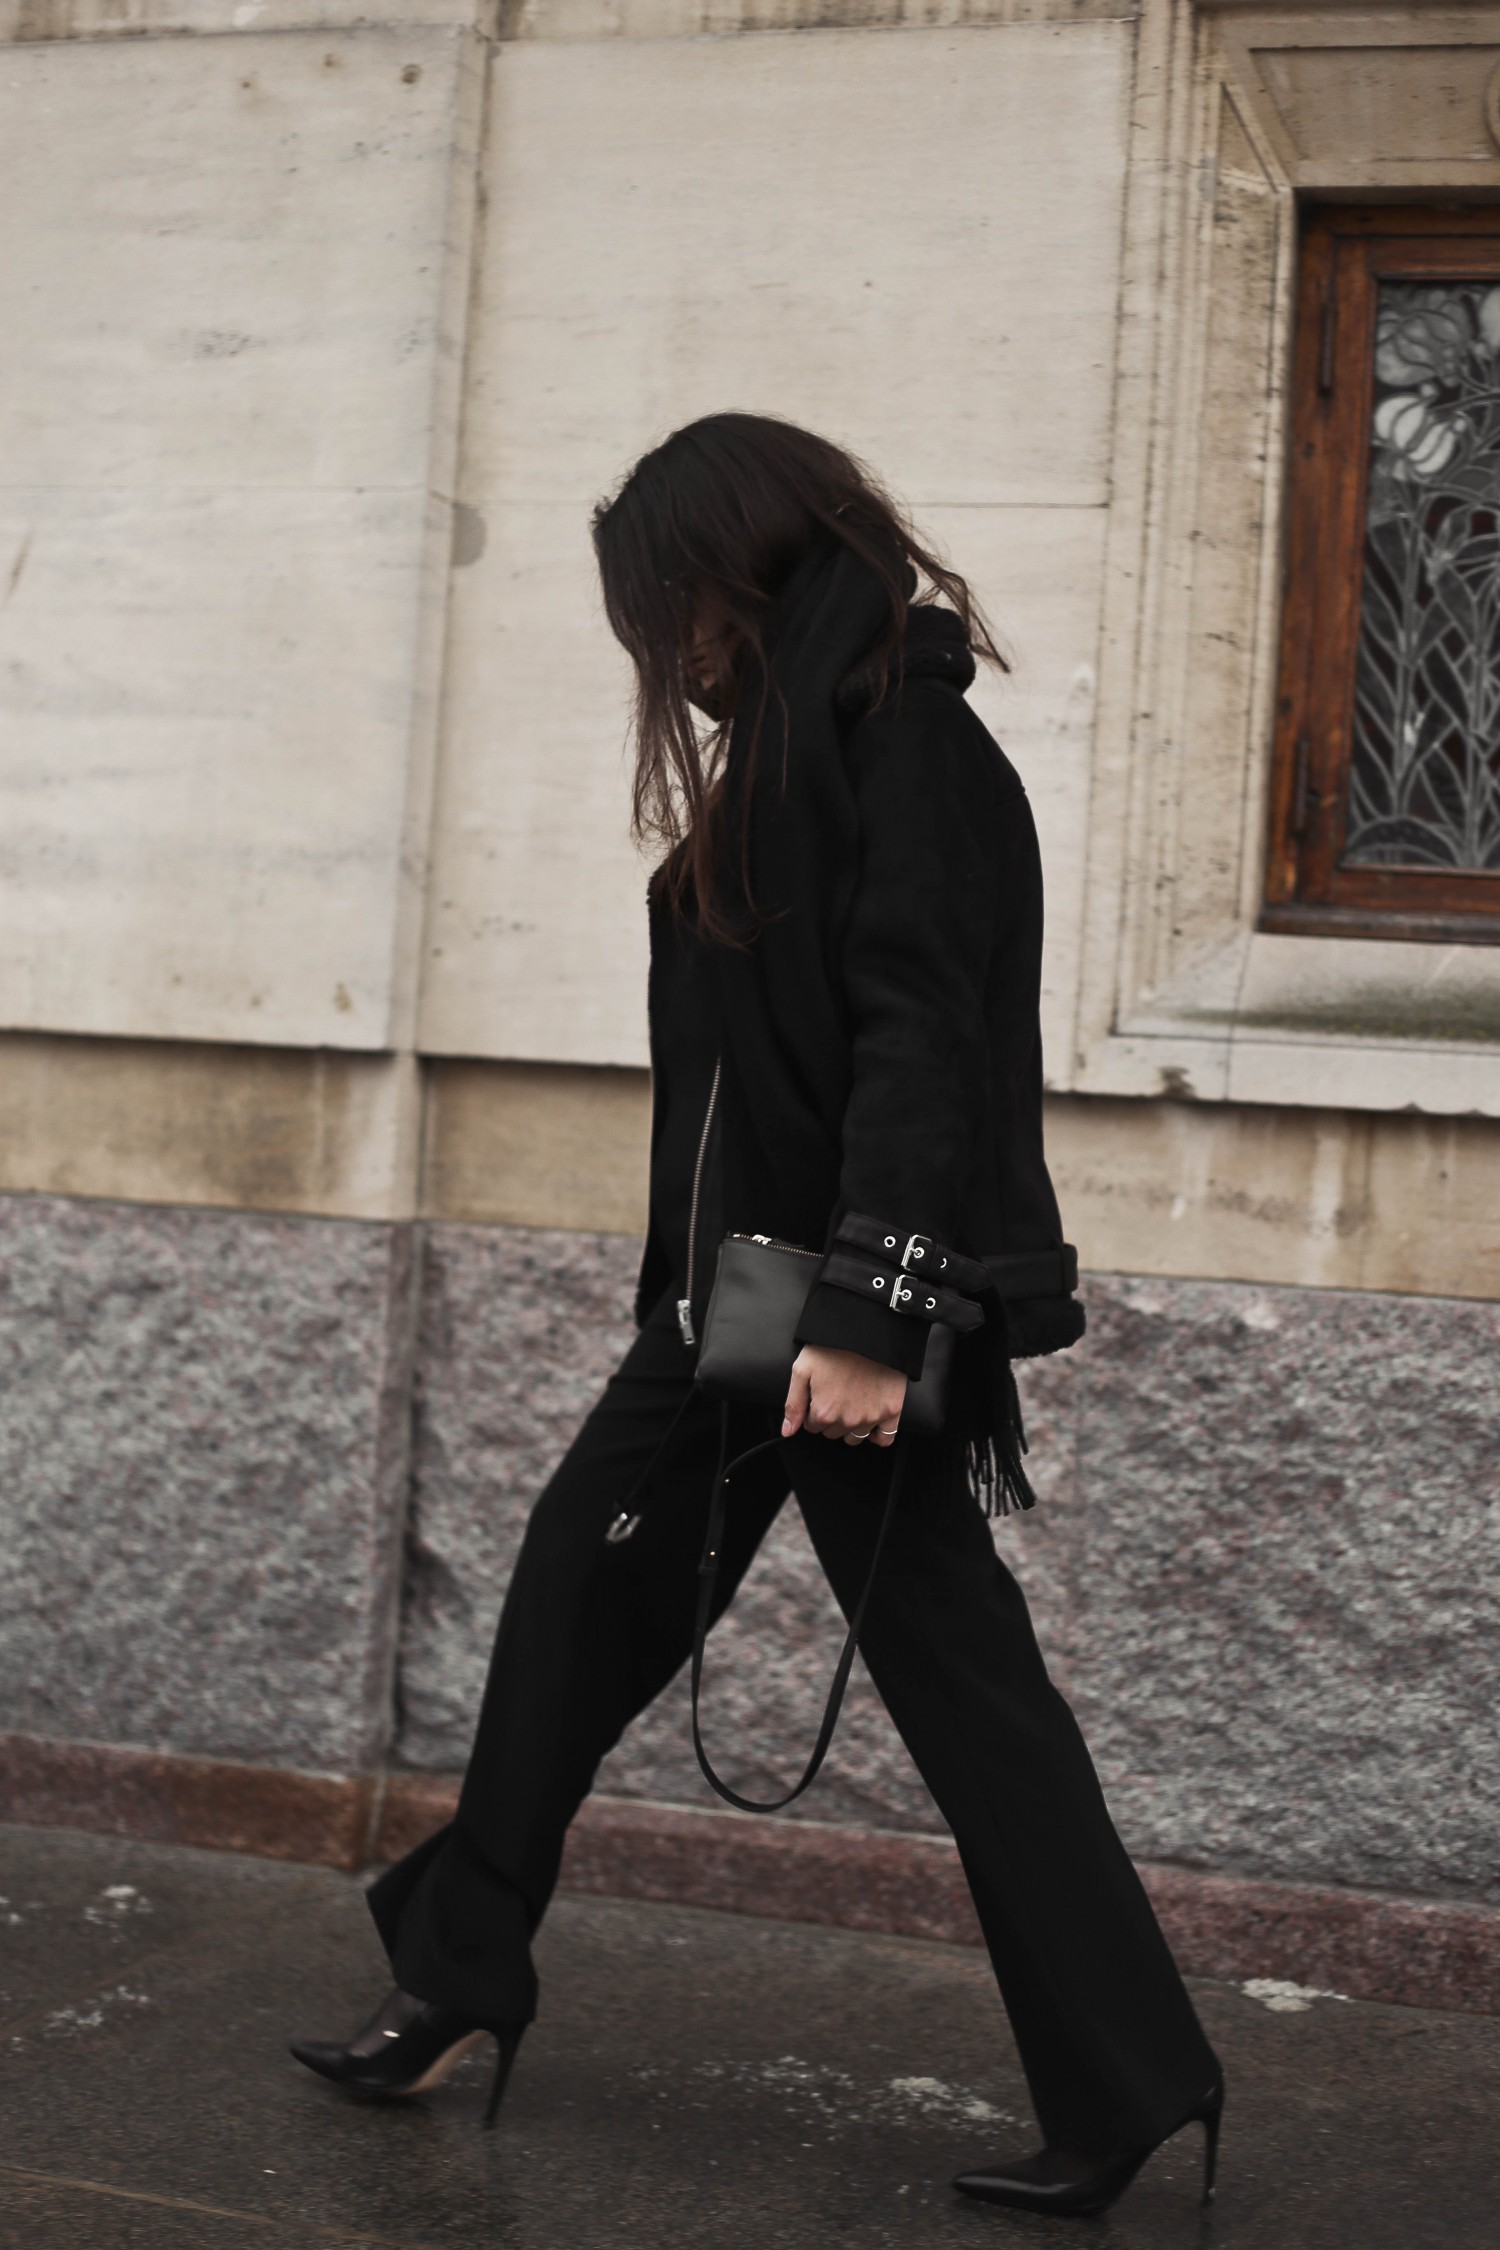 shearling coat-38, shearling coat, gina tricot, hoss pants, pumps, zara pumps, pointy heels, shearling coat outfit, shearling coat style, all black outfit, tailored pants, wide pants outfit, mowoblog, mowo blog, celine trio bag outfit, black on black outfit, winter outfit, danish fashion blogger, fashion blogger, blogger, blogger europe, blog, fashion blog, style blog, danish, scandinavian style